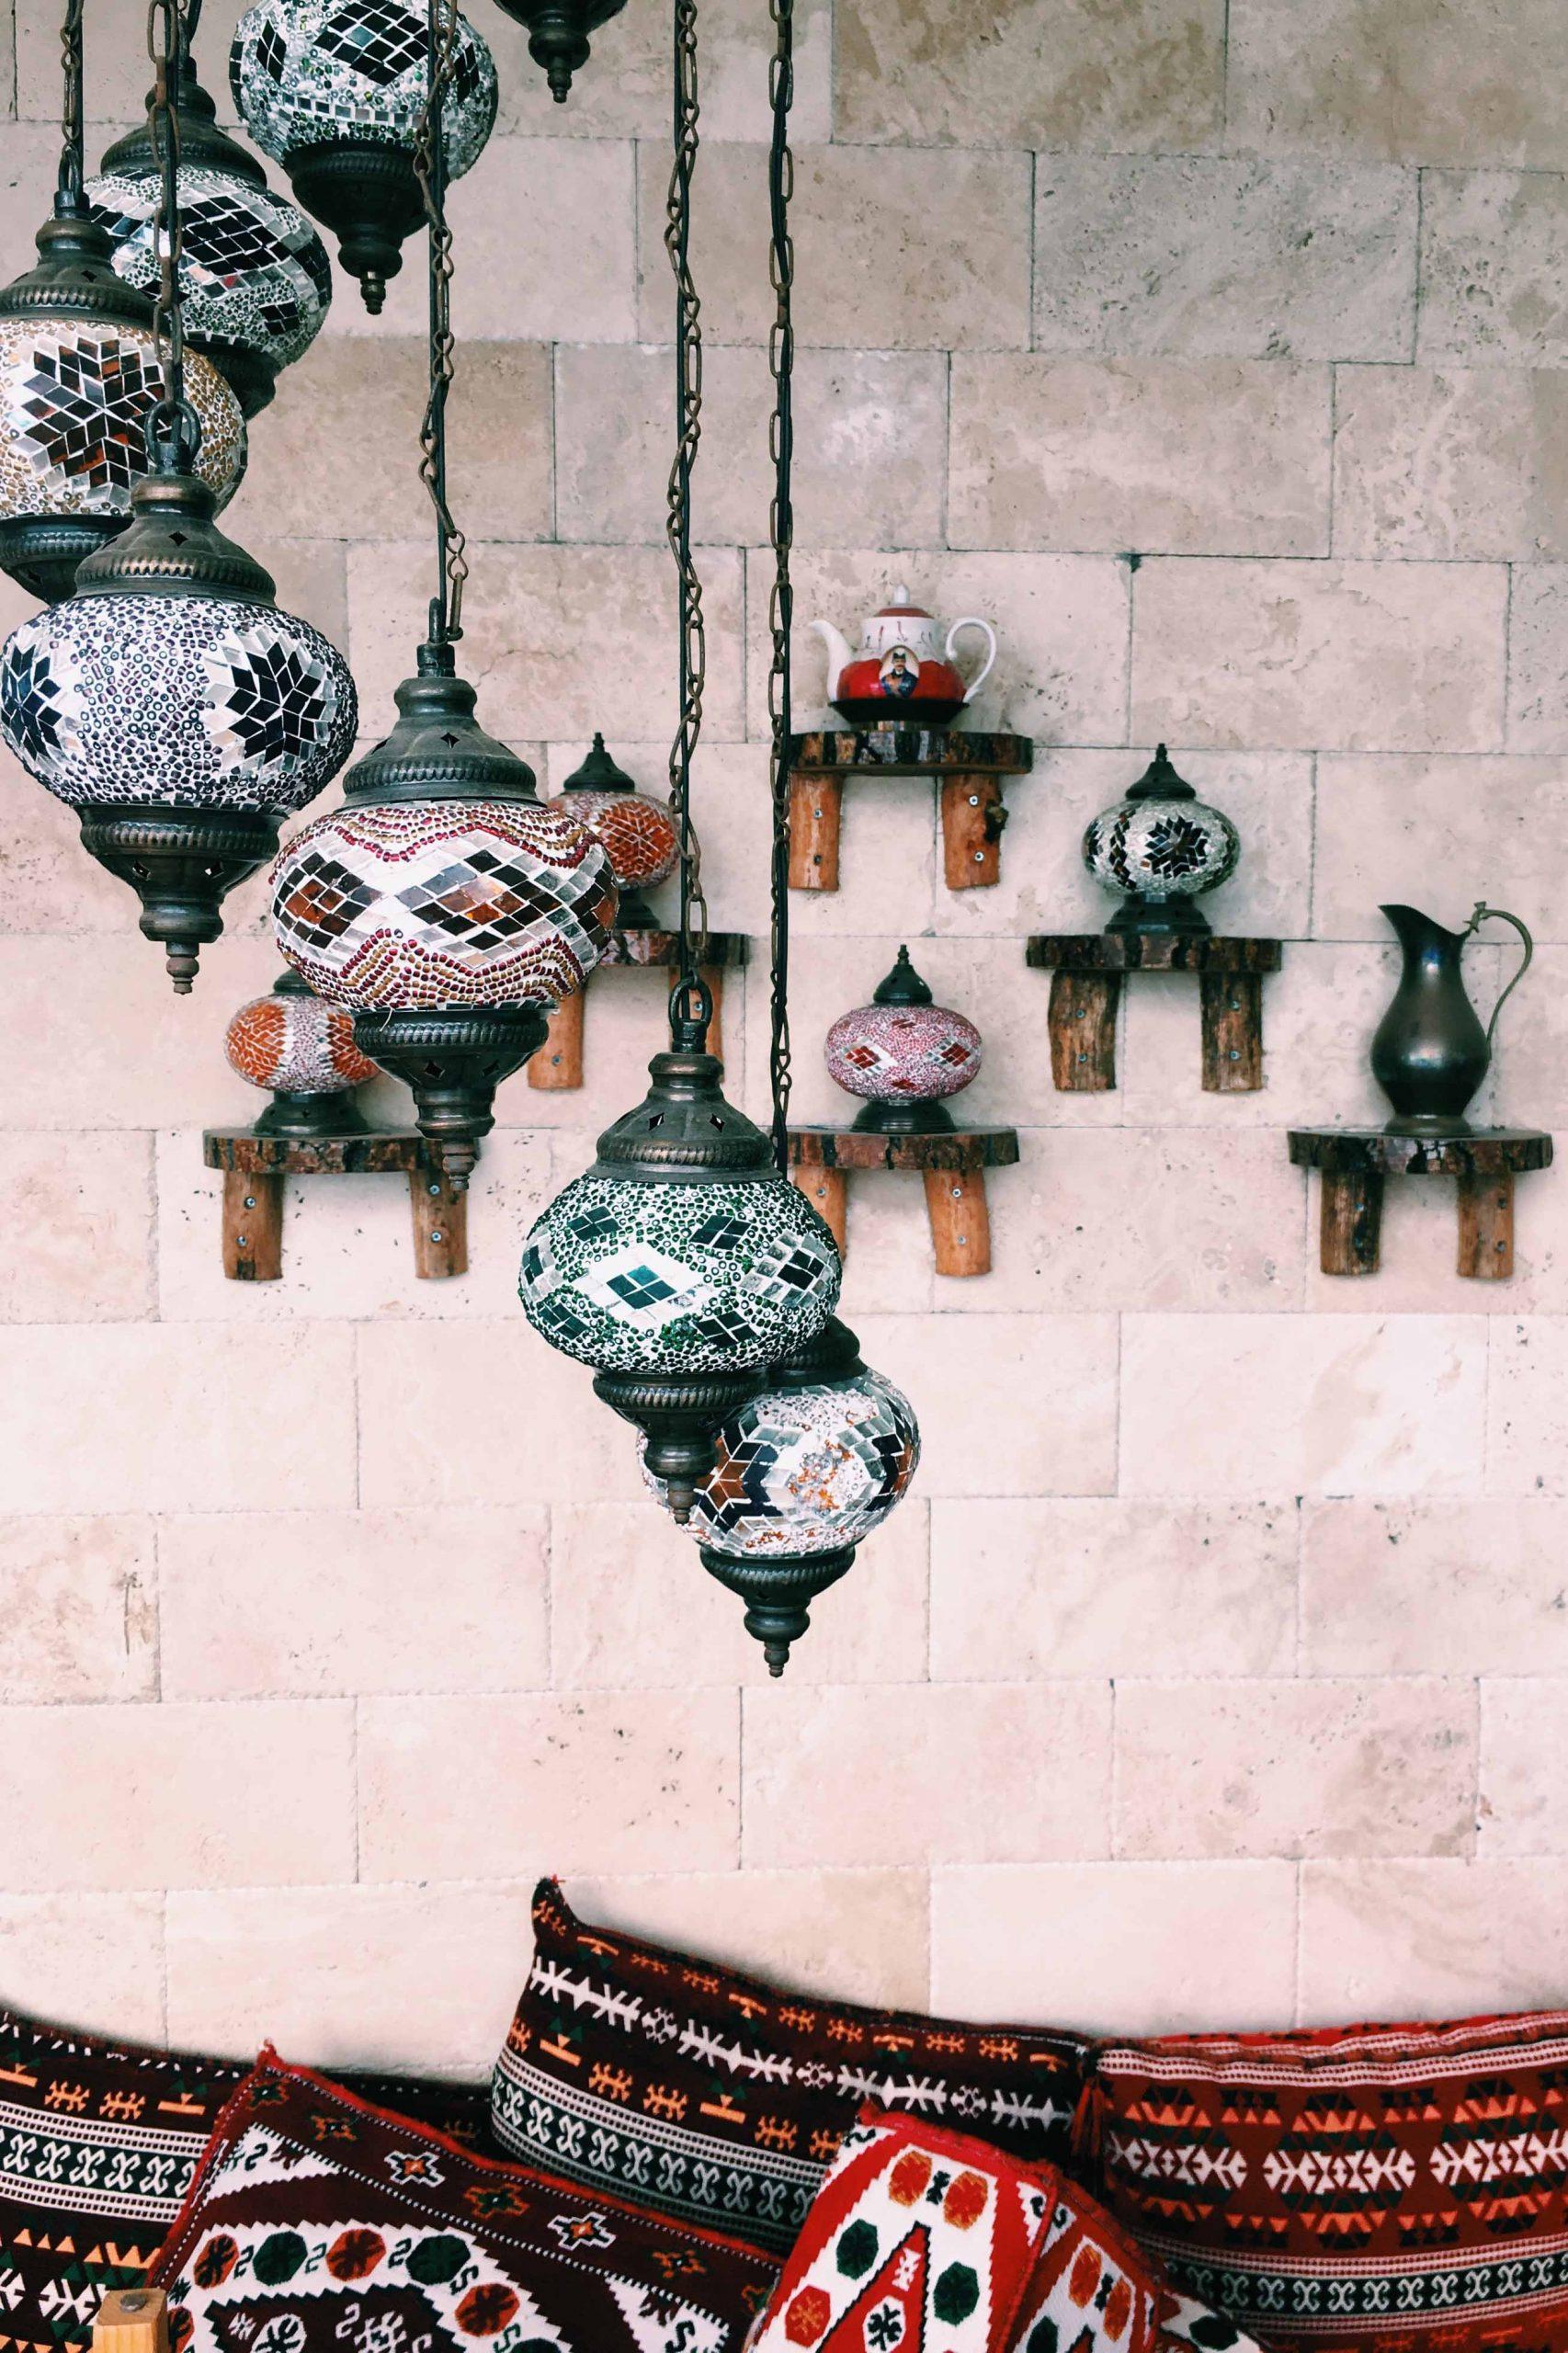 Bazaar, Turkish lamps, Antalya, Turkey - Kargıcak Mahallesi, Gold City İçi Yolu, Antalya, Turkey